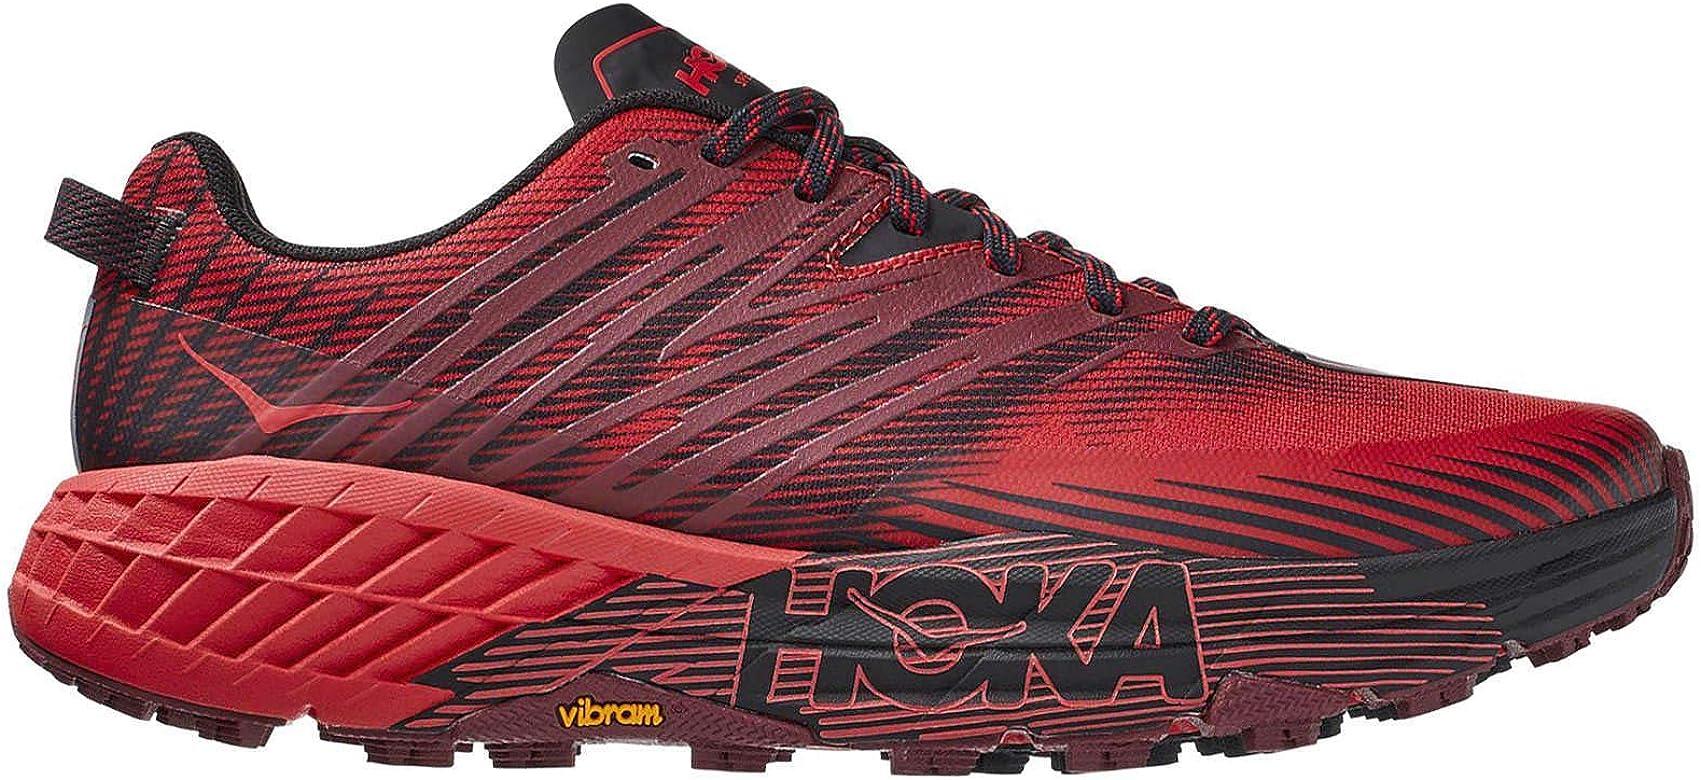 Hoka One One Hombre Speedgoat 4 Textile Synthetic Cordovan High Risk Red Entrenadores 40 2/3 EU: Amazon.es: Zapatos y complementos